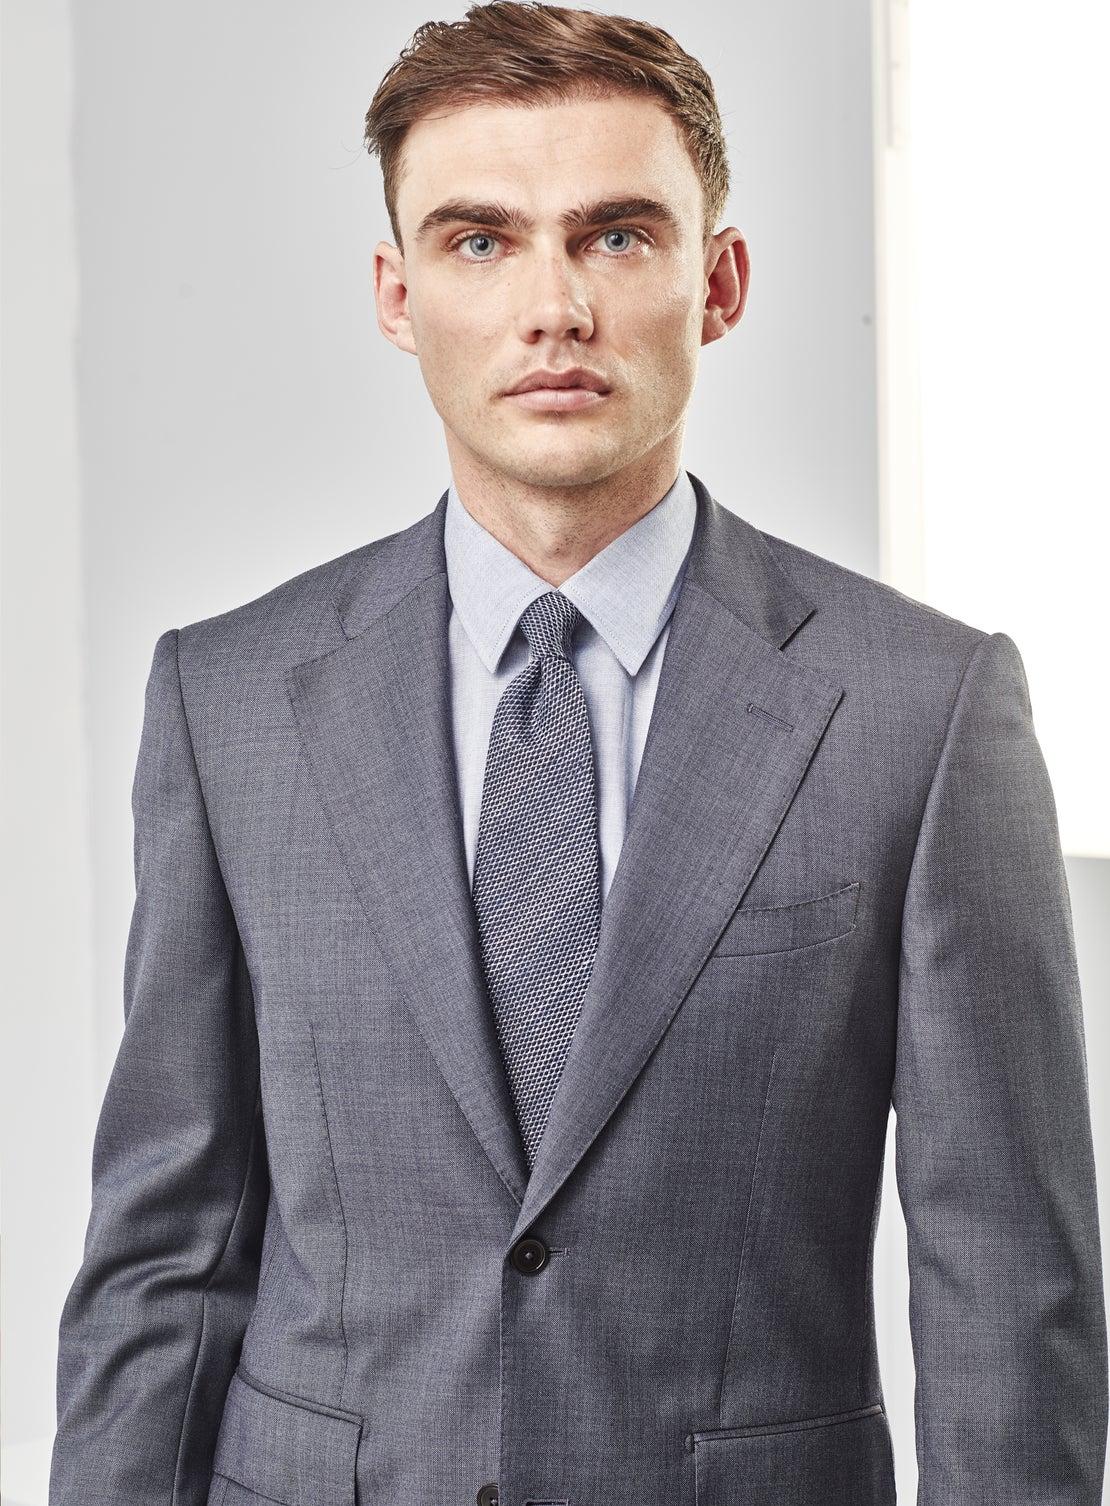 Denim Blue Suit